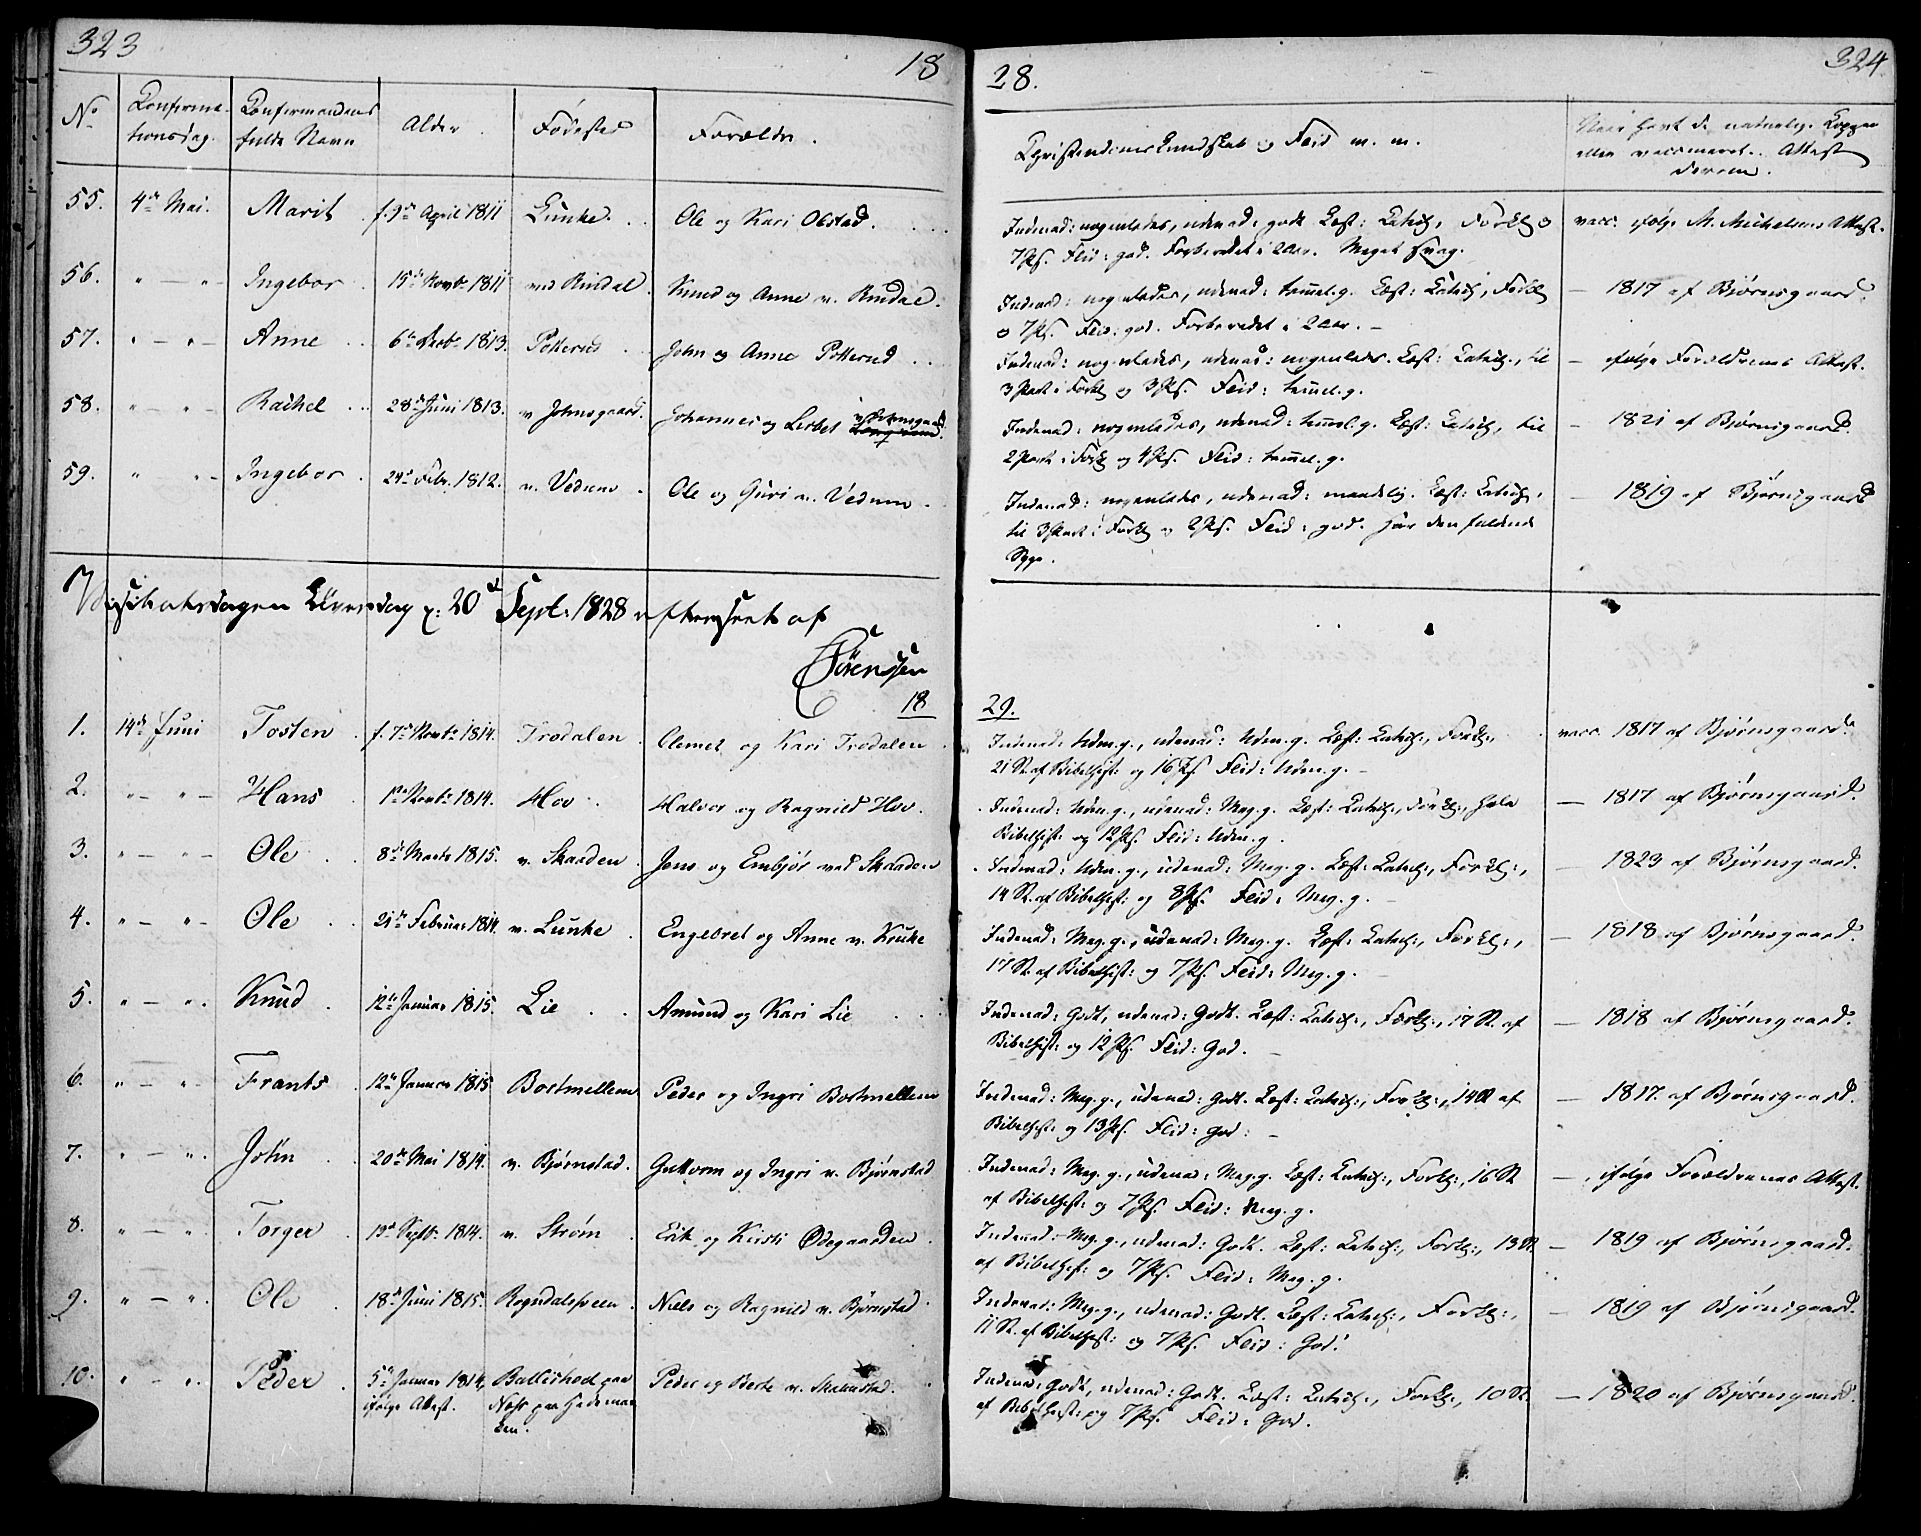 SAH, Øyer prestekontor, Ministerialbok nr. 4, 1824-1841, s. 323-324